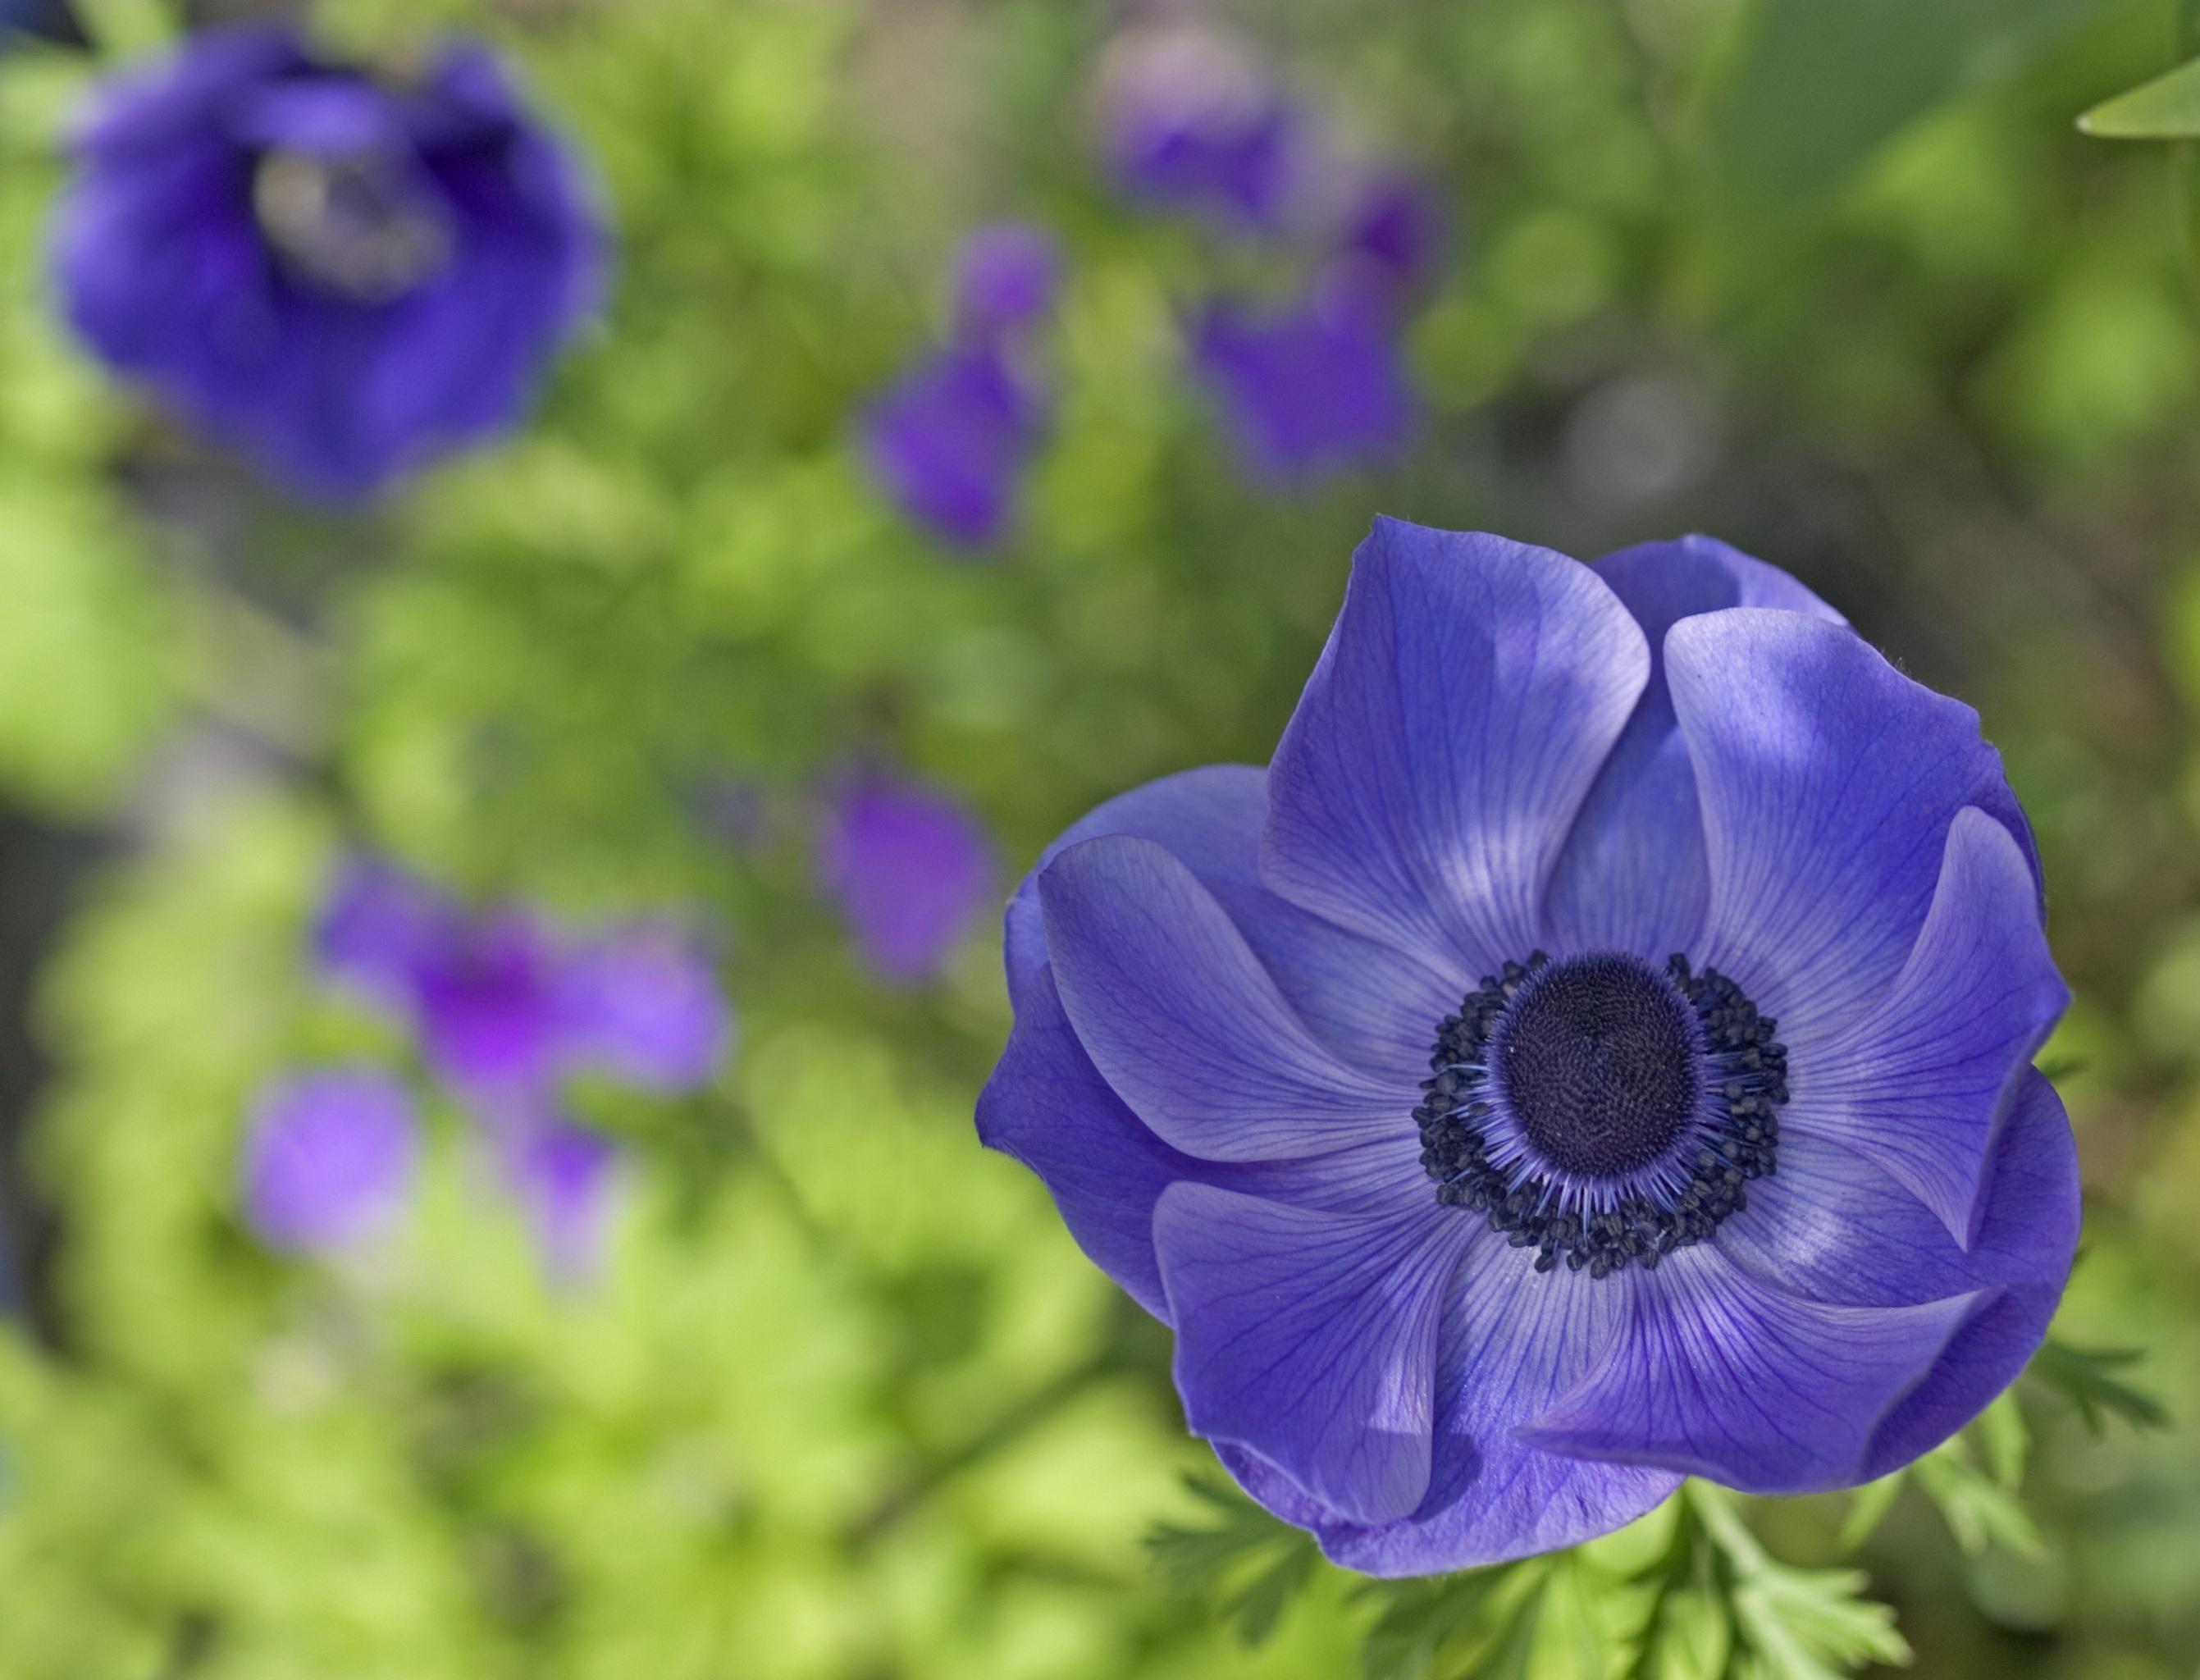 kostenloses foto zum thema anemone blau blume. Black Bedroom Furniture Sets. Home Design Ideas